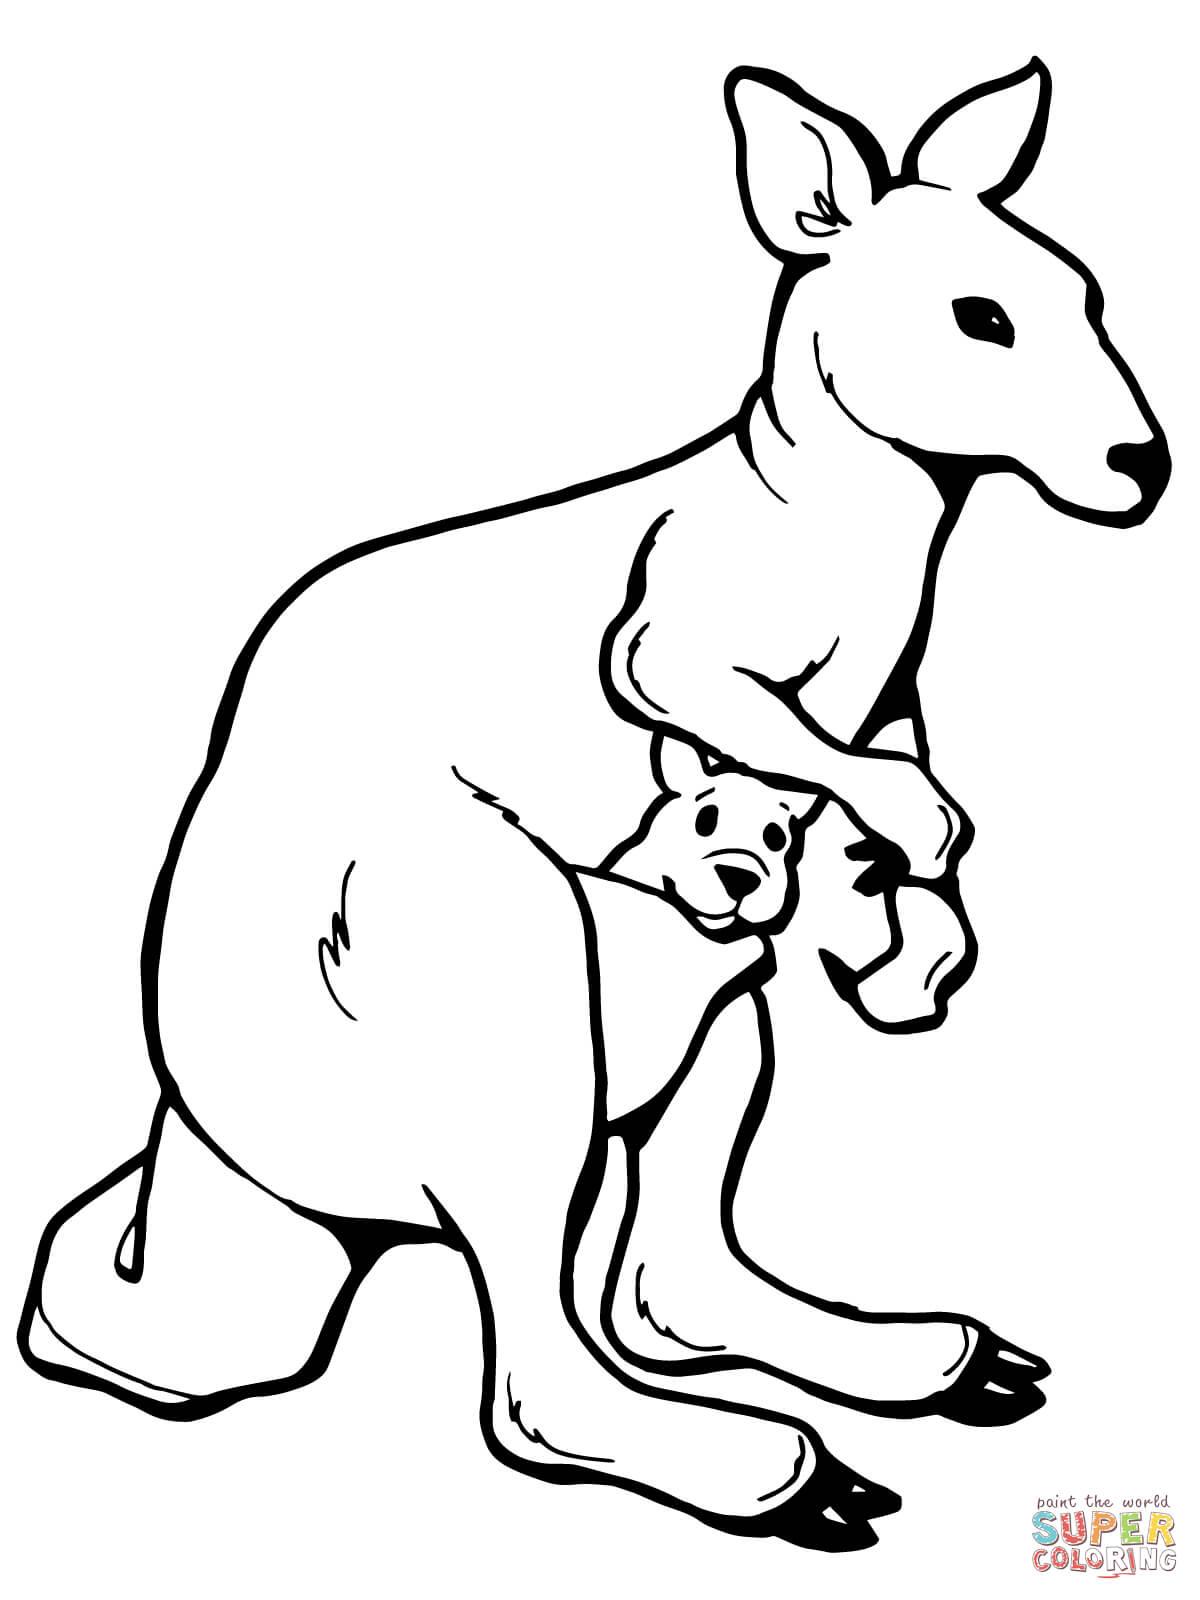 Kangaroo Coloring Page Cute Coloring